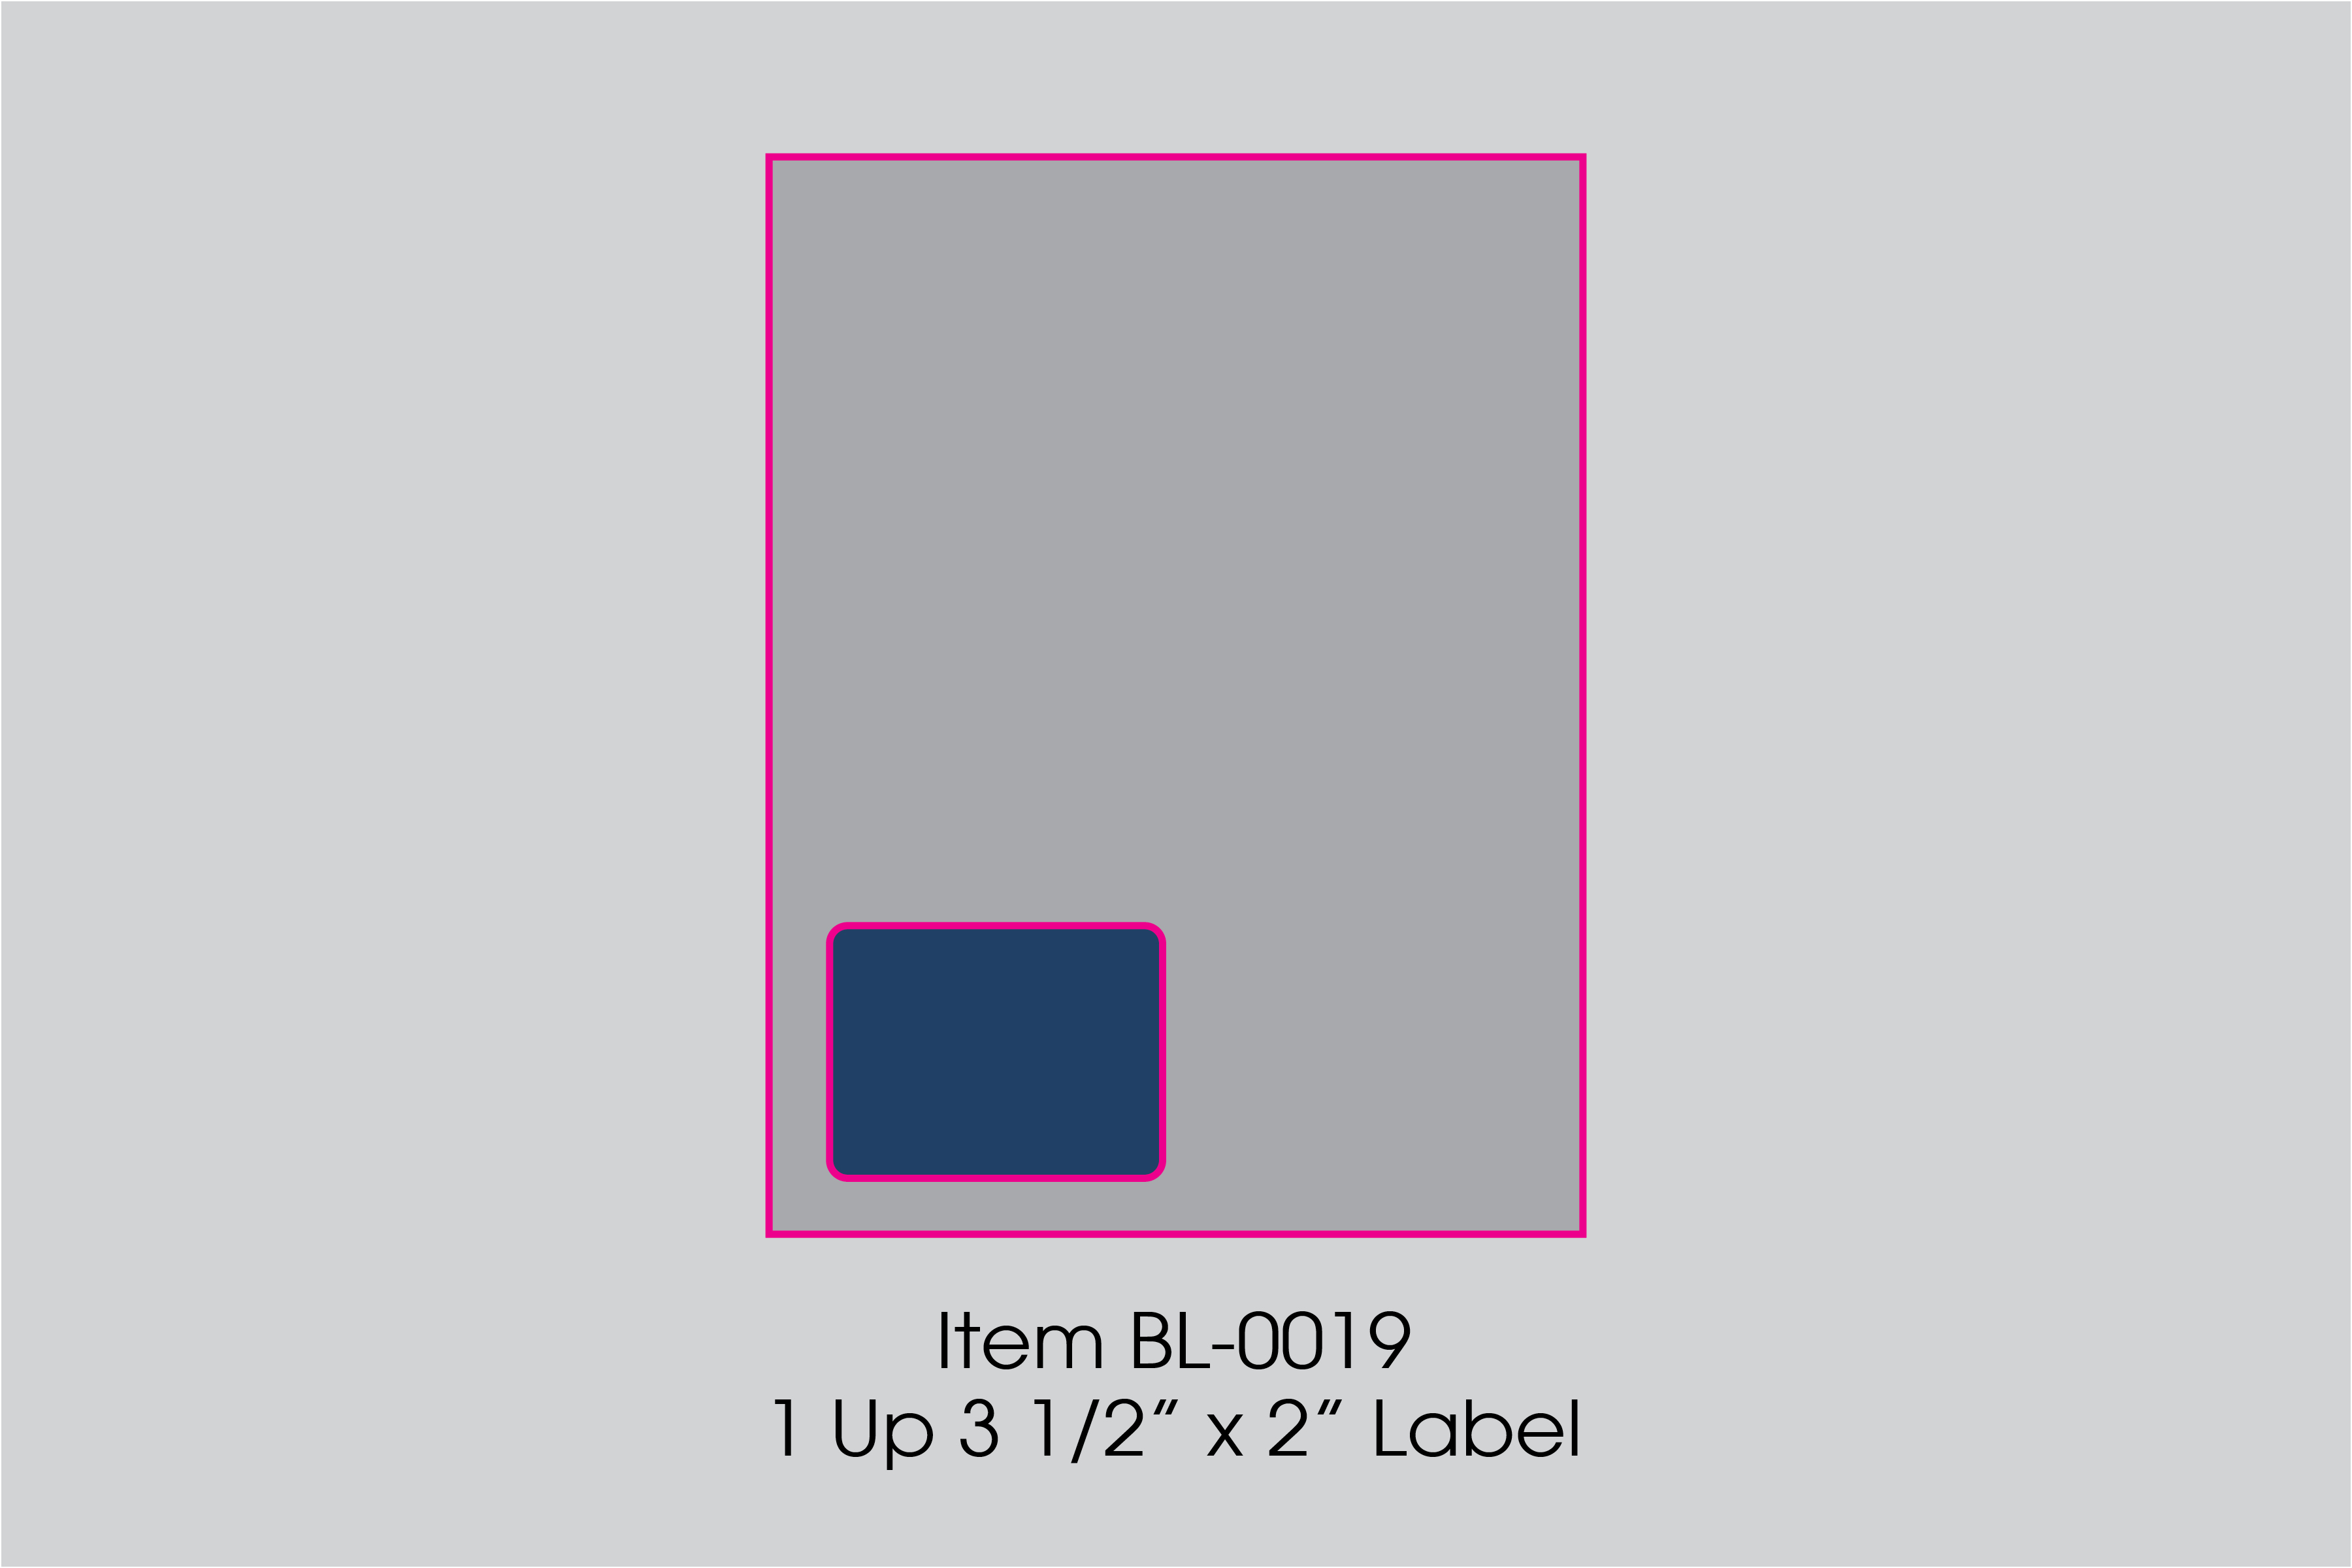 BL-0019